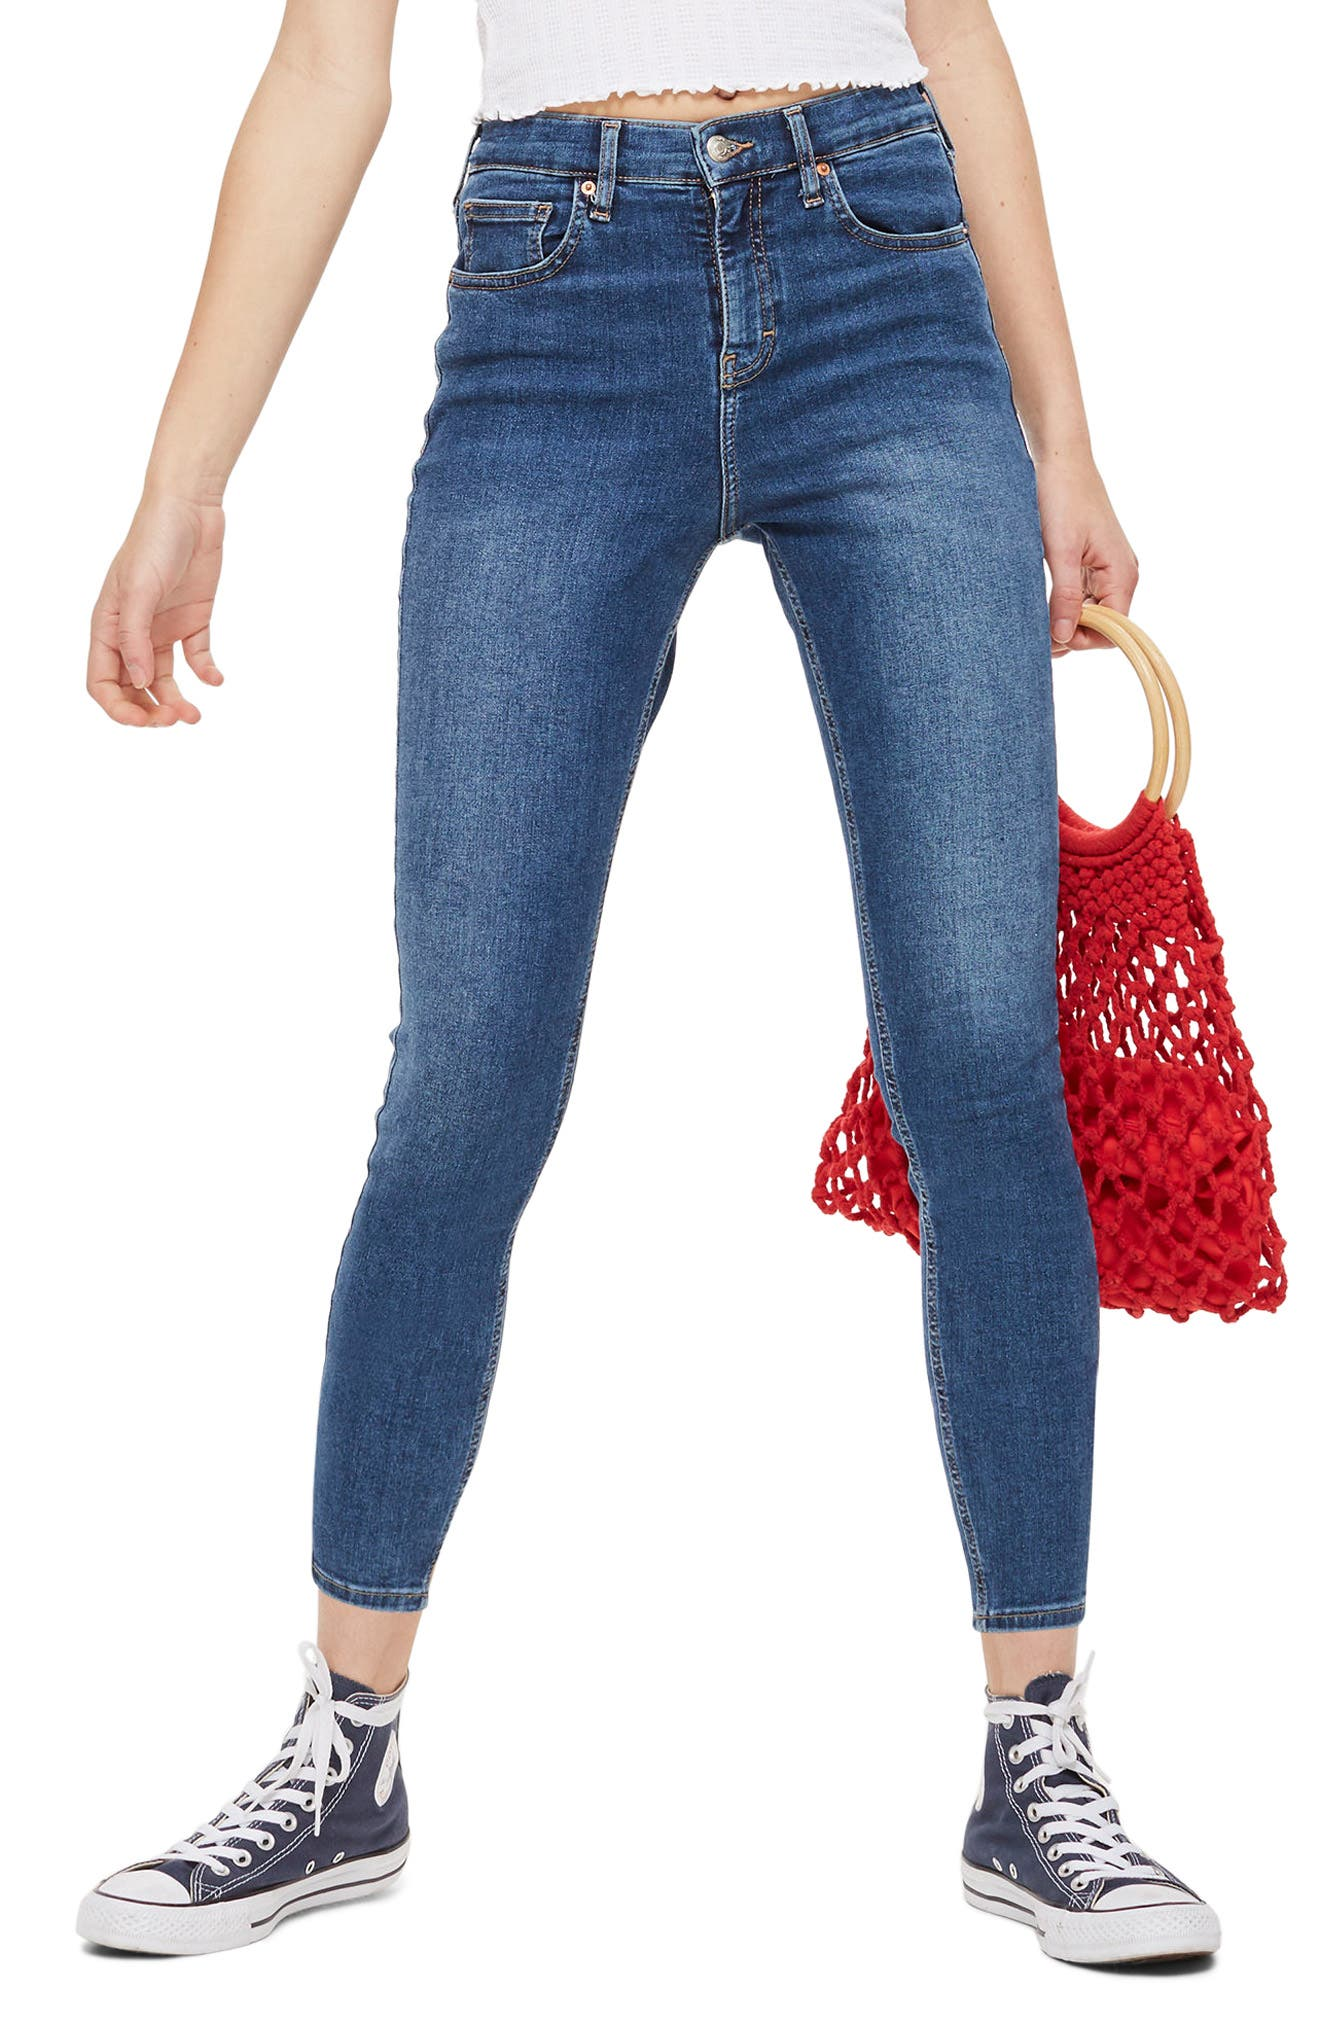 Topshop Jamie Petite Jeans (Indigo)